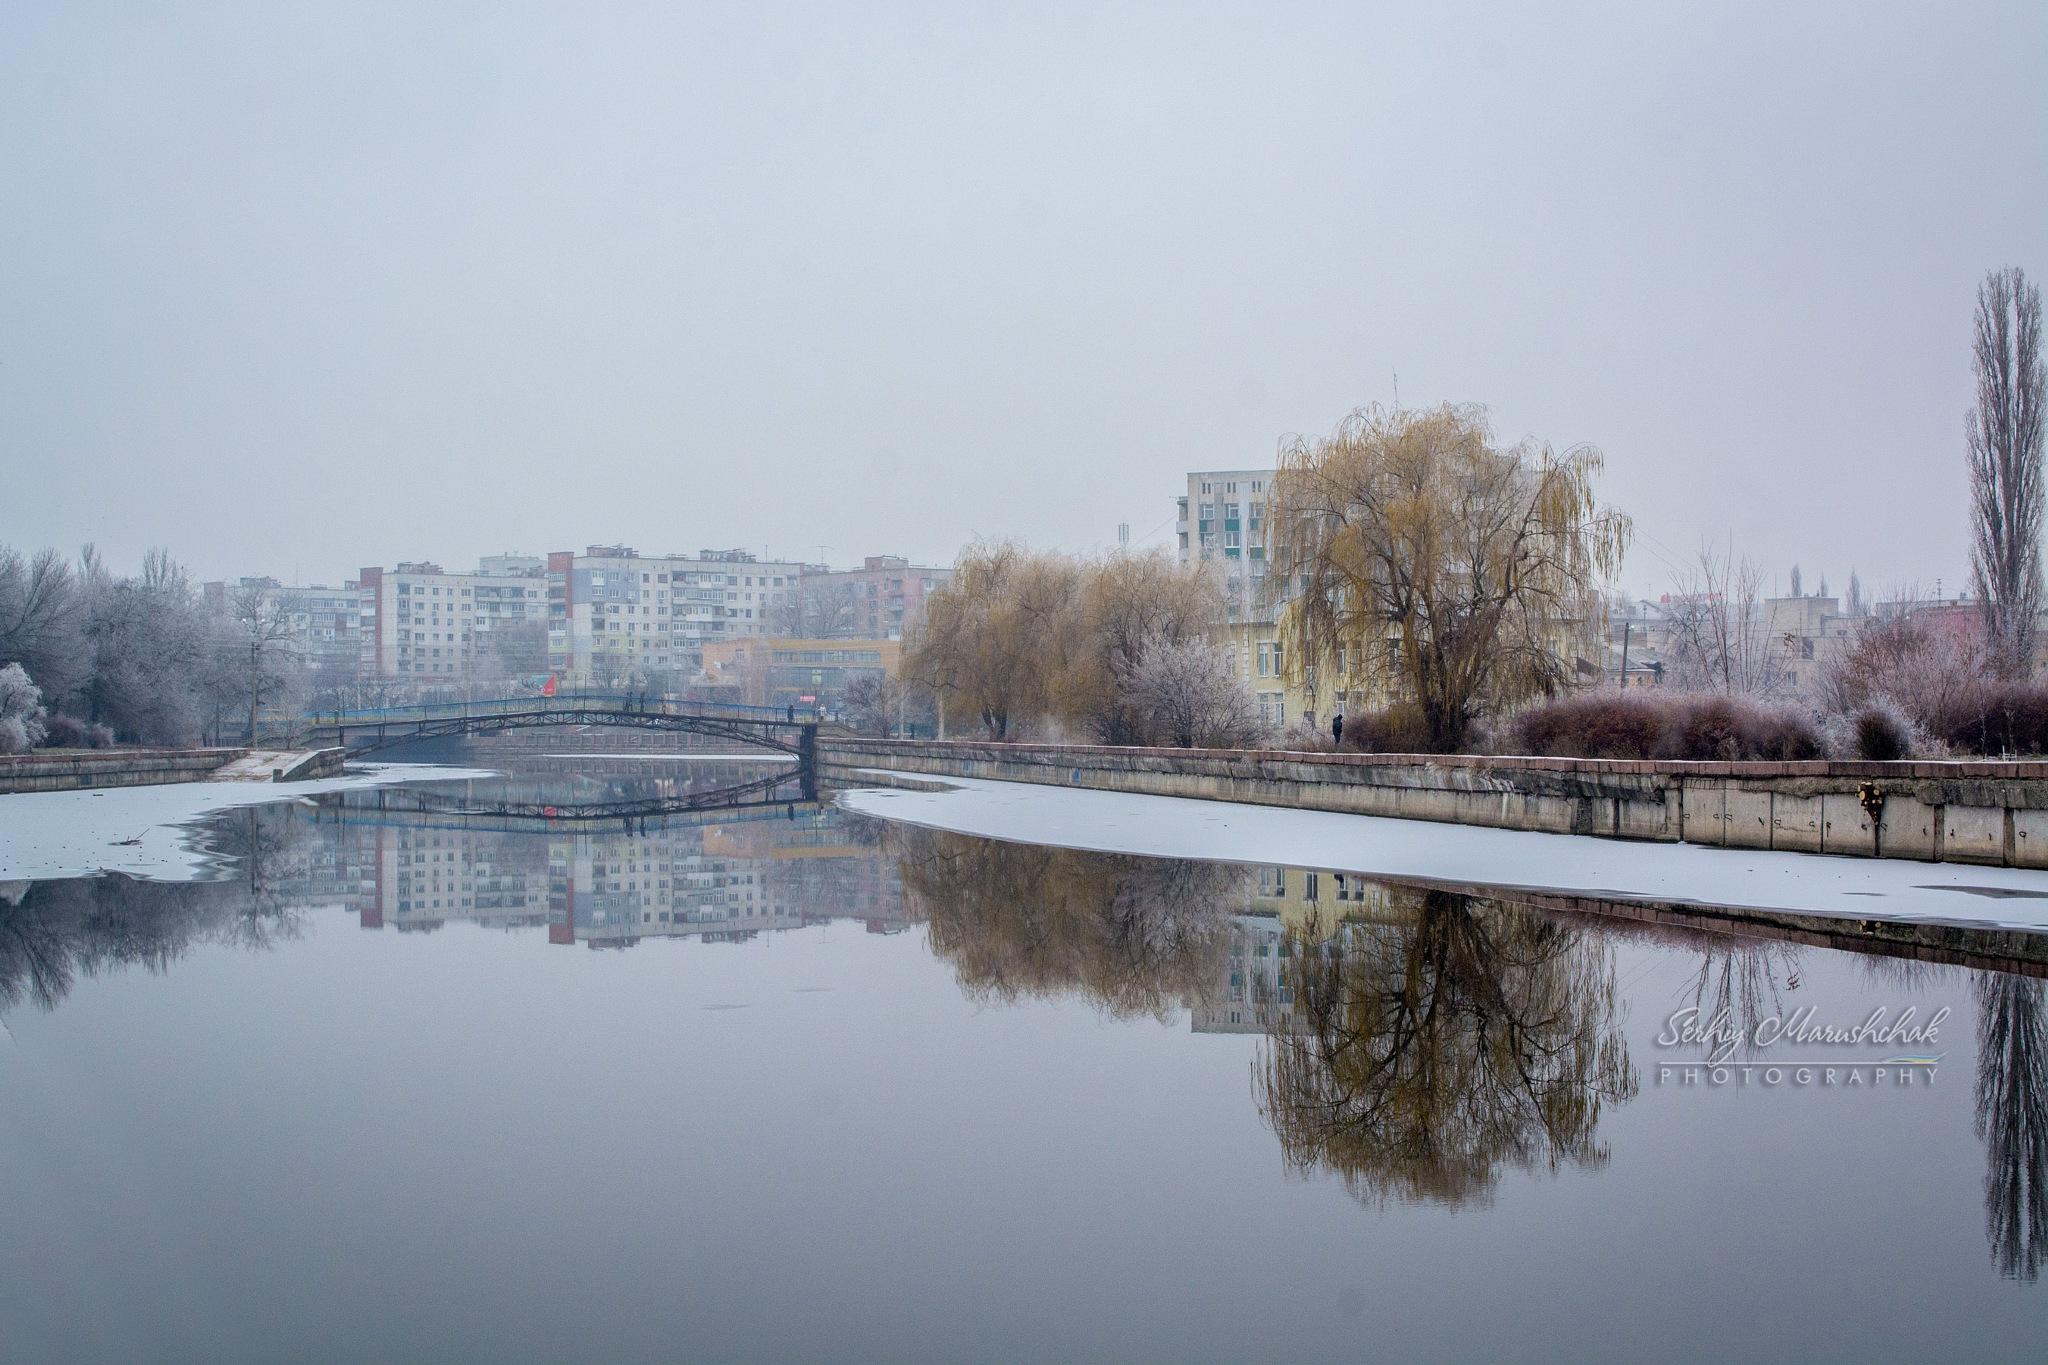 Ранкова ріка... / Morning river... by artmars07